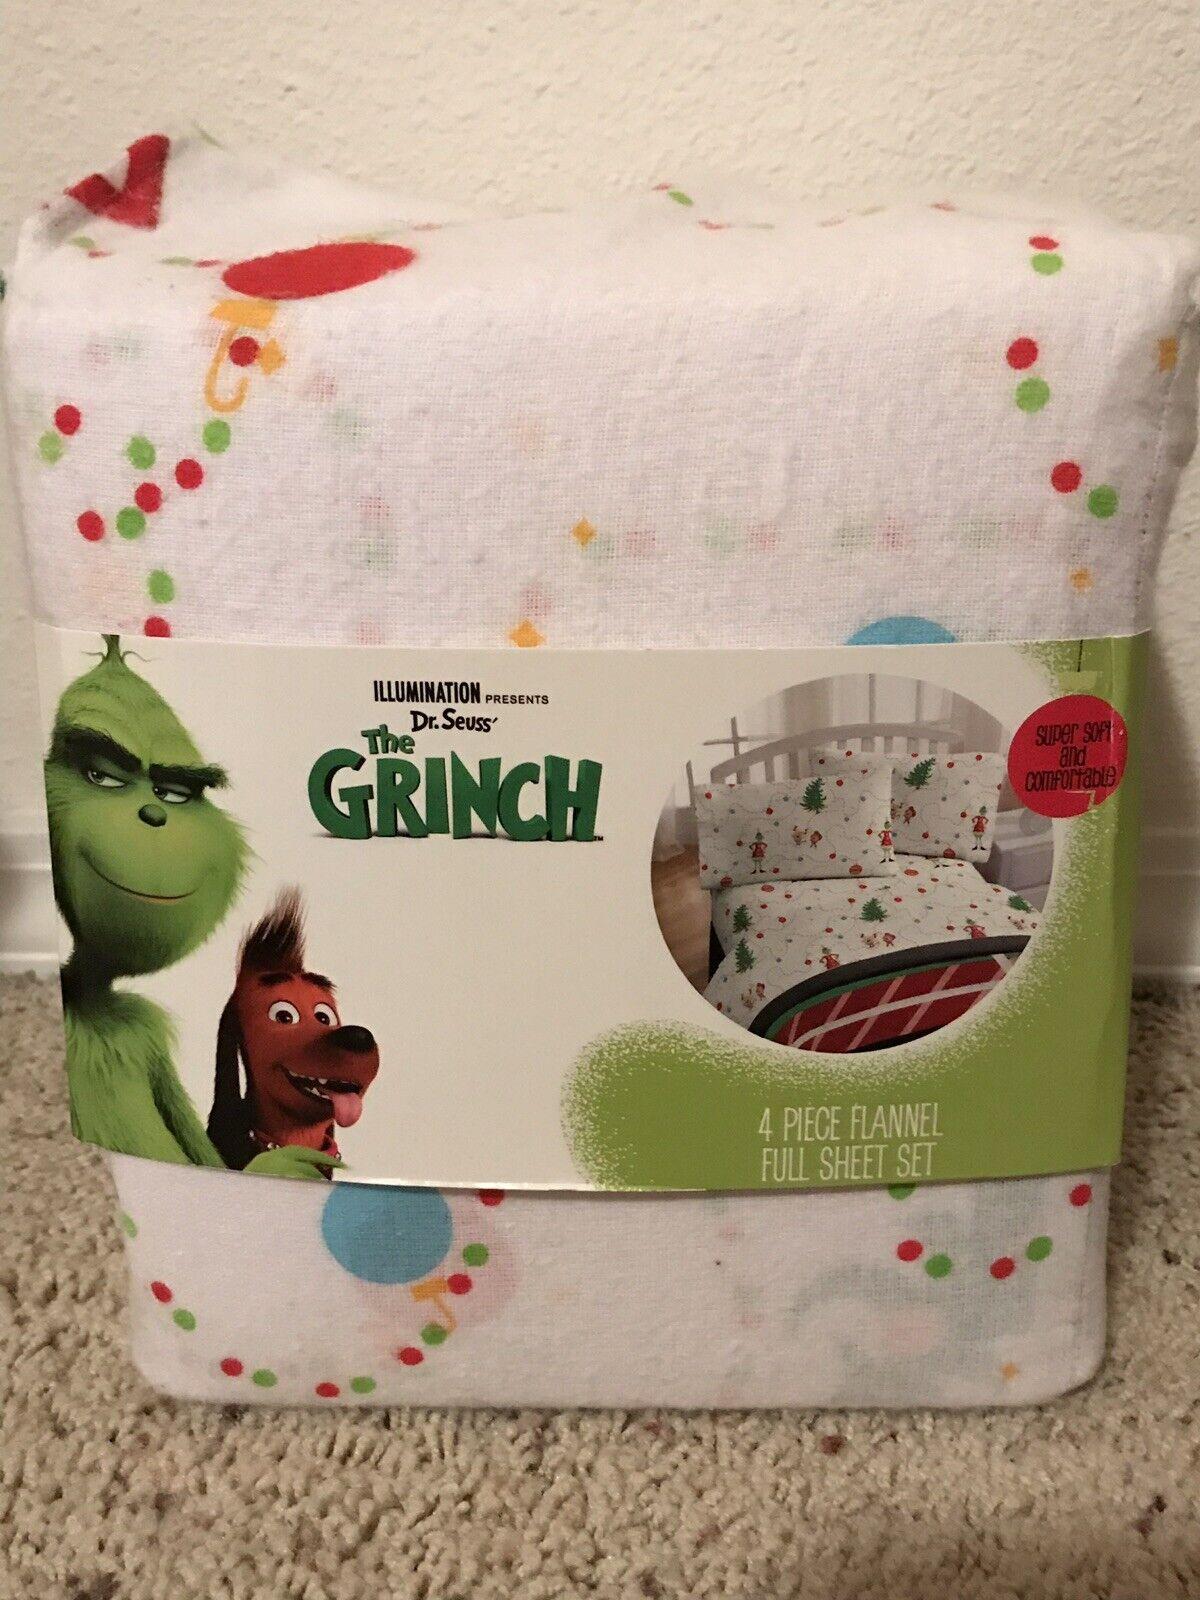 Le Grinch FULL SHEET Set 4 pièces FLANELLE Feuille Set Brand New